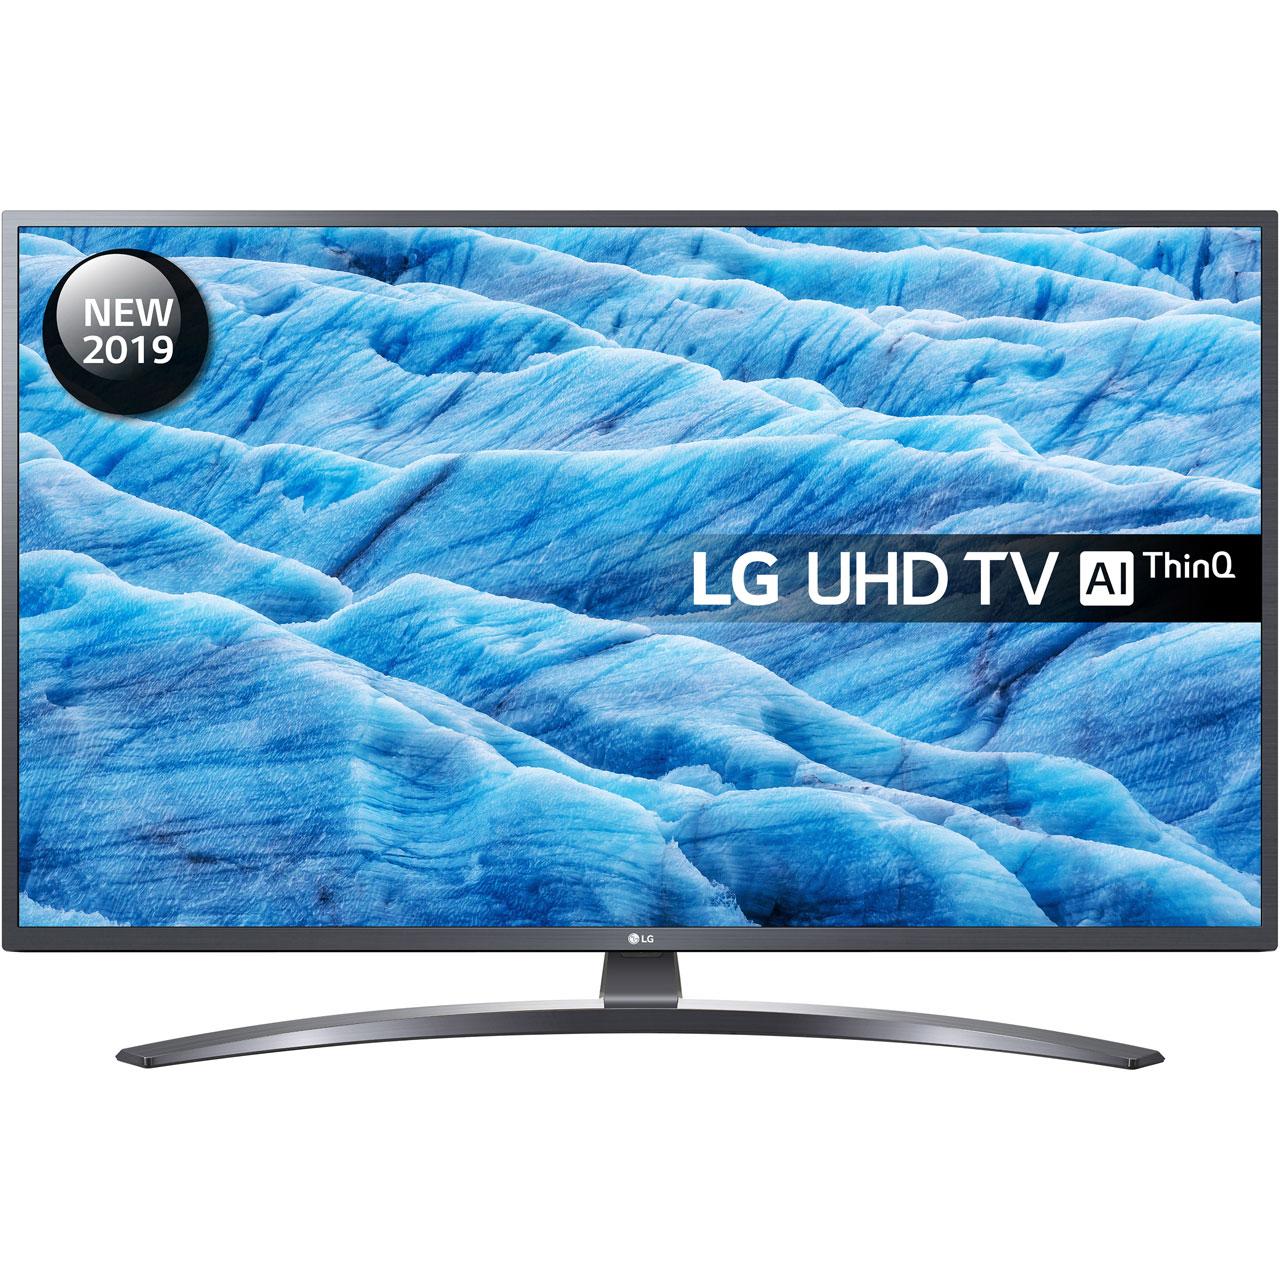 "Telewizor 55"" LG 55UM7400, 4K, Smart, 50Hz, Ai, IPS, HDR, Direct Led (a model 49 "" za 1799 zł 49UM7400)"